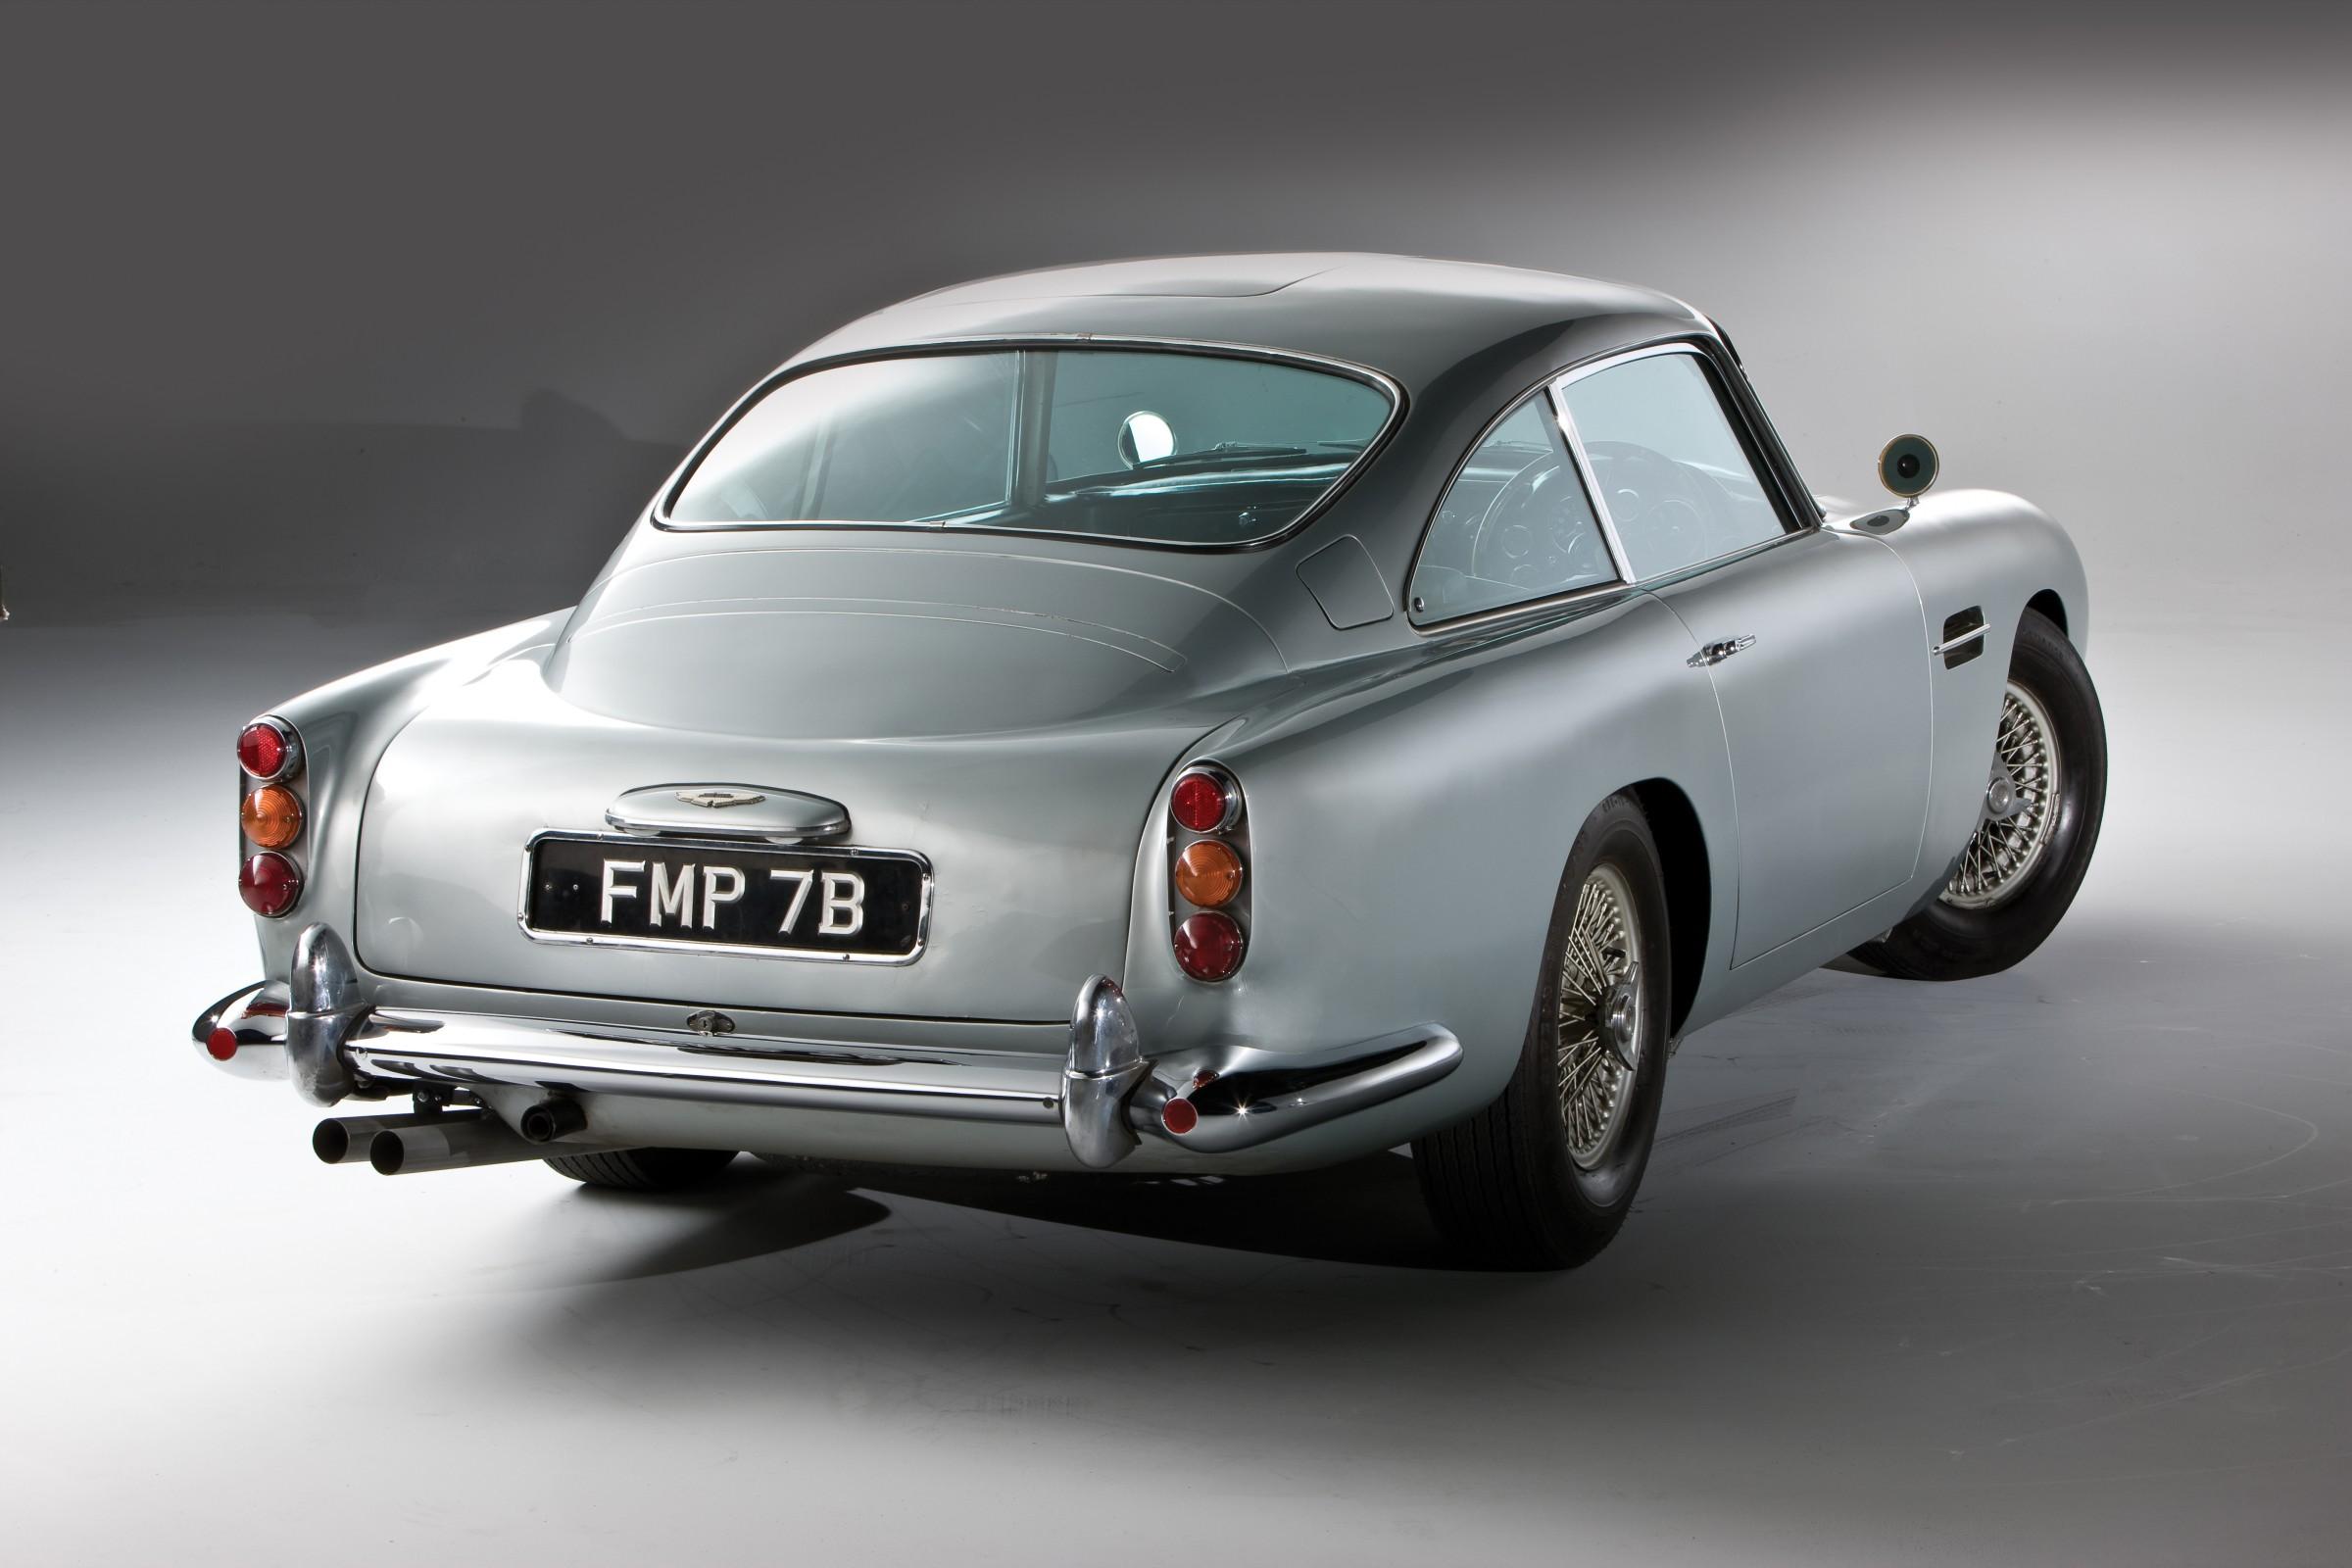 Aston Martin DB5 James Bond Edition Wallpapers Car wallpapers HD 2400x1600